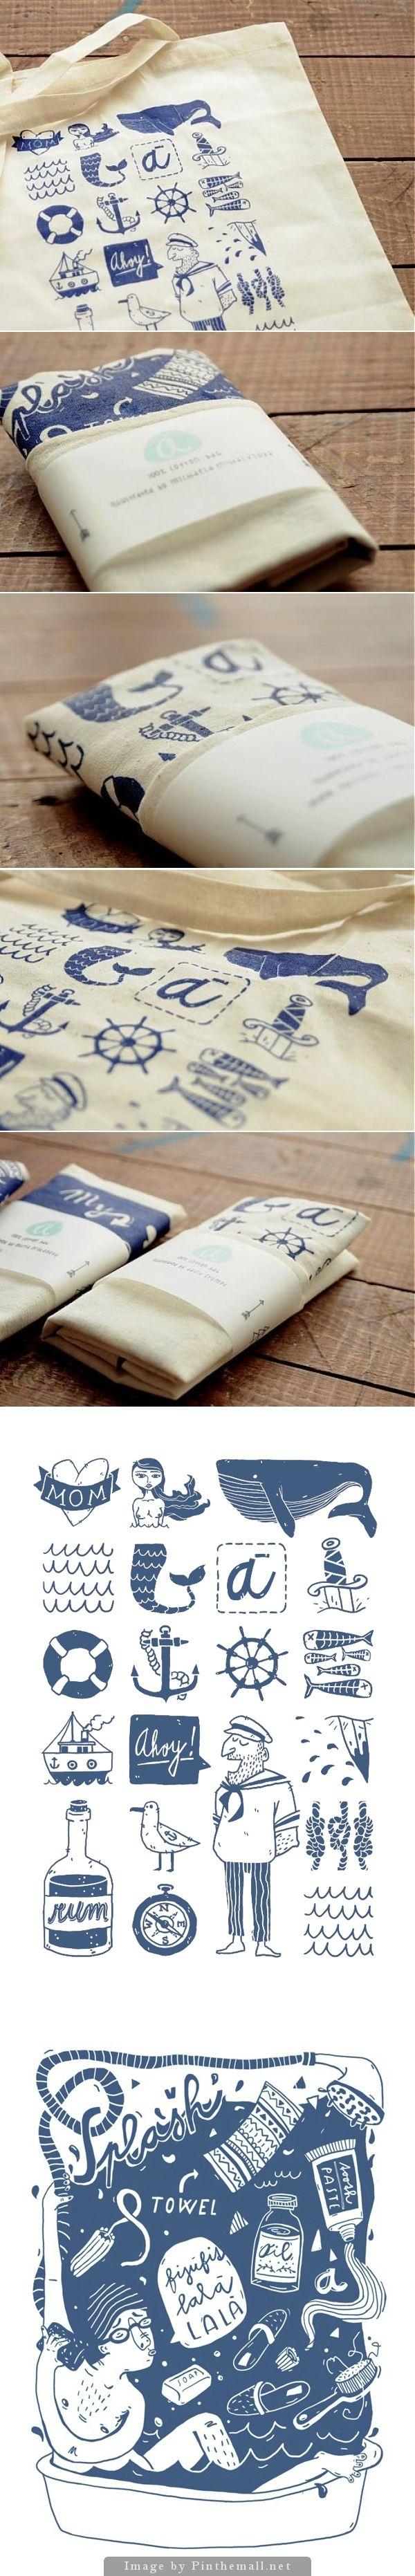 #packaging #design #illustration